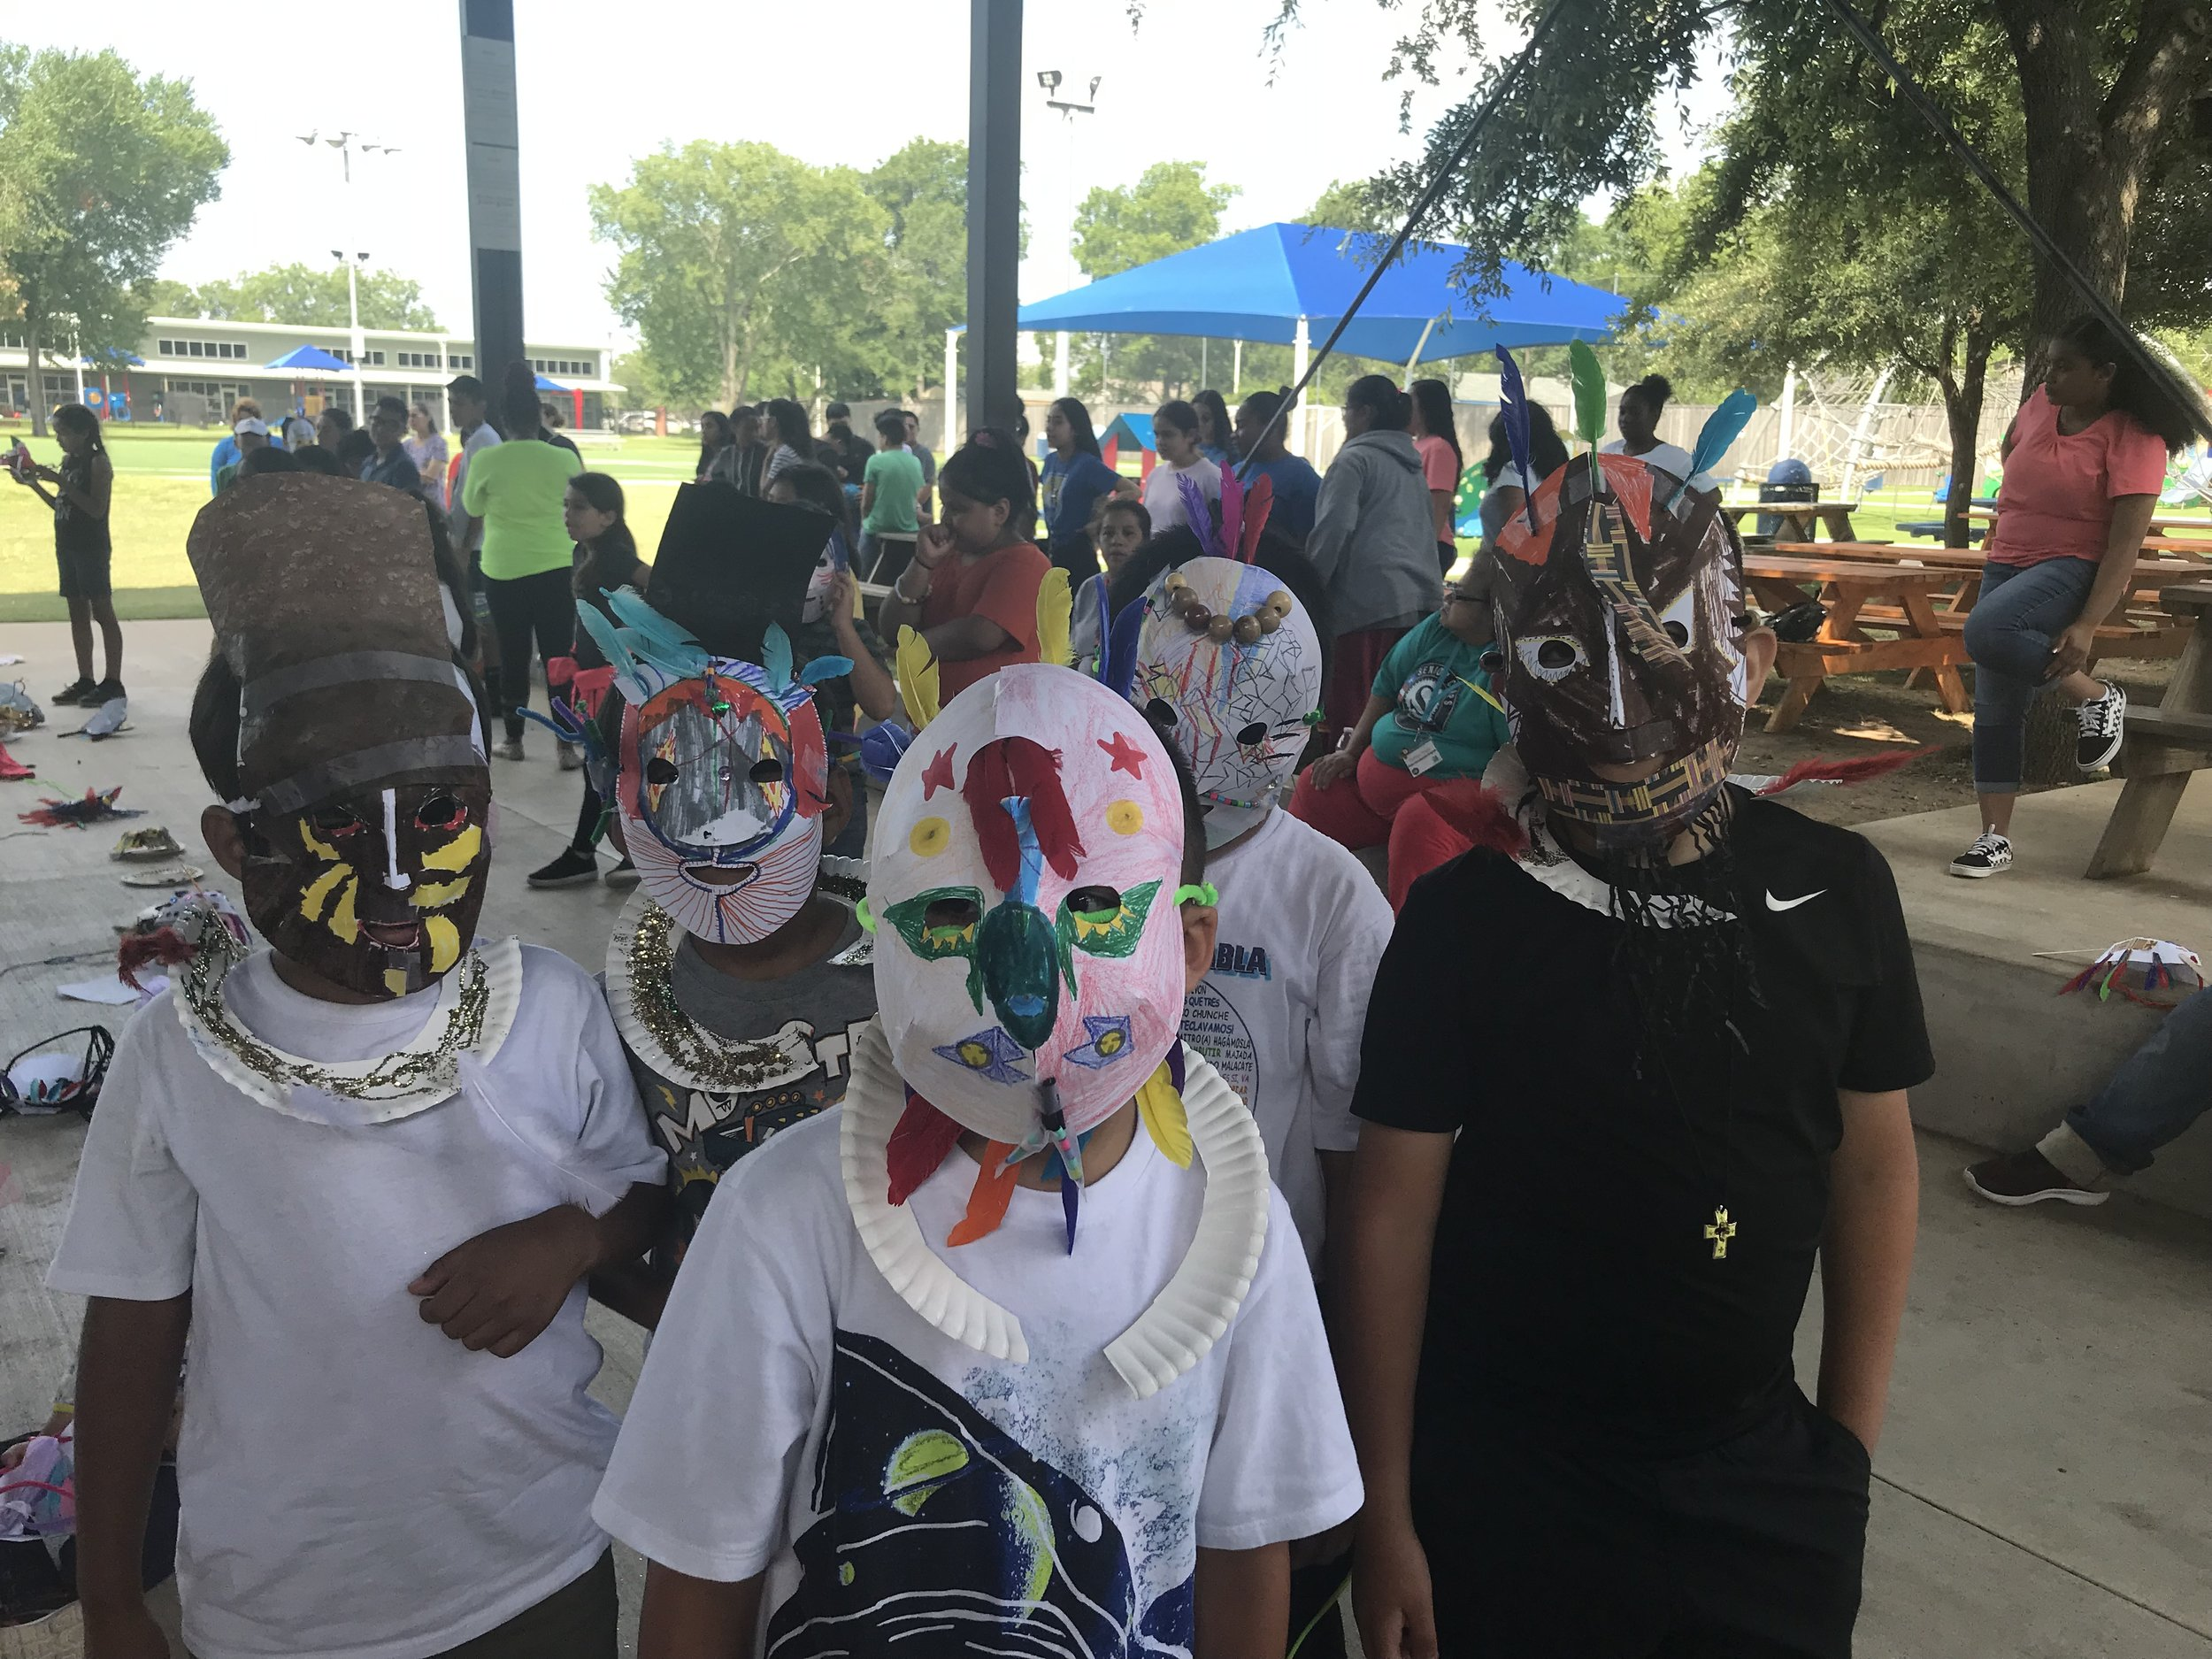 group - masks on.jpg